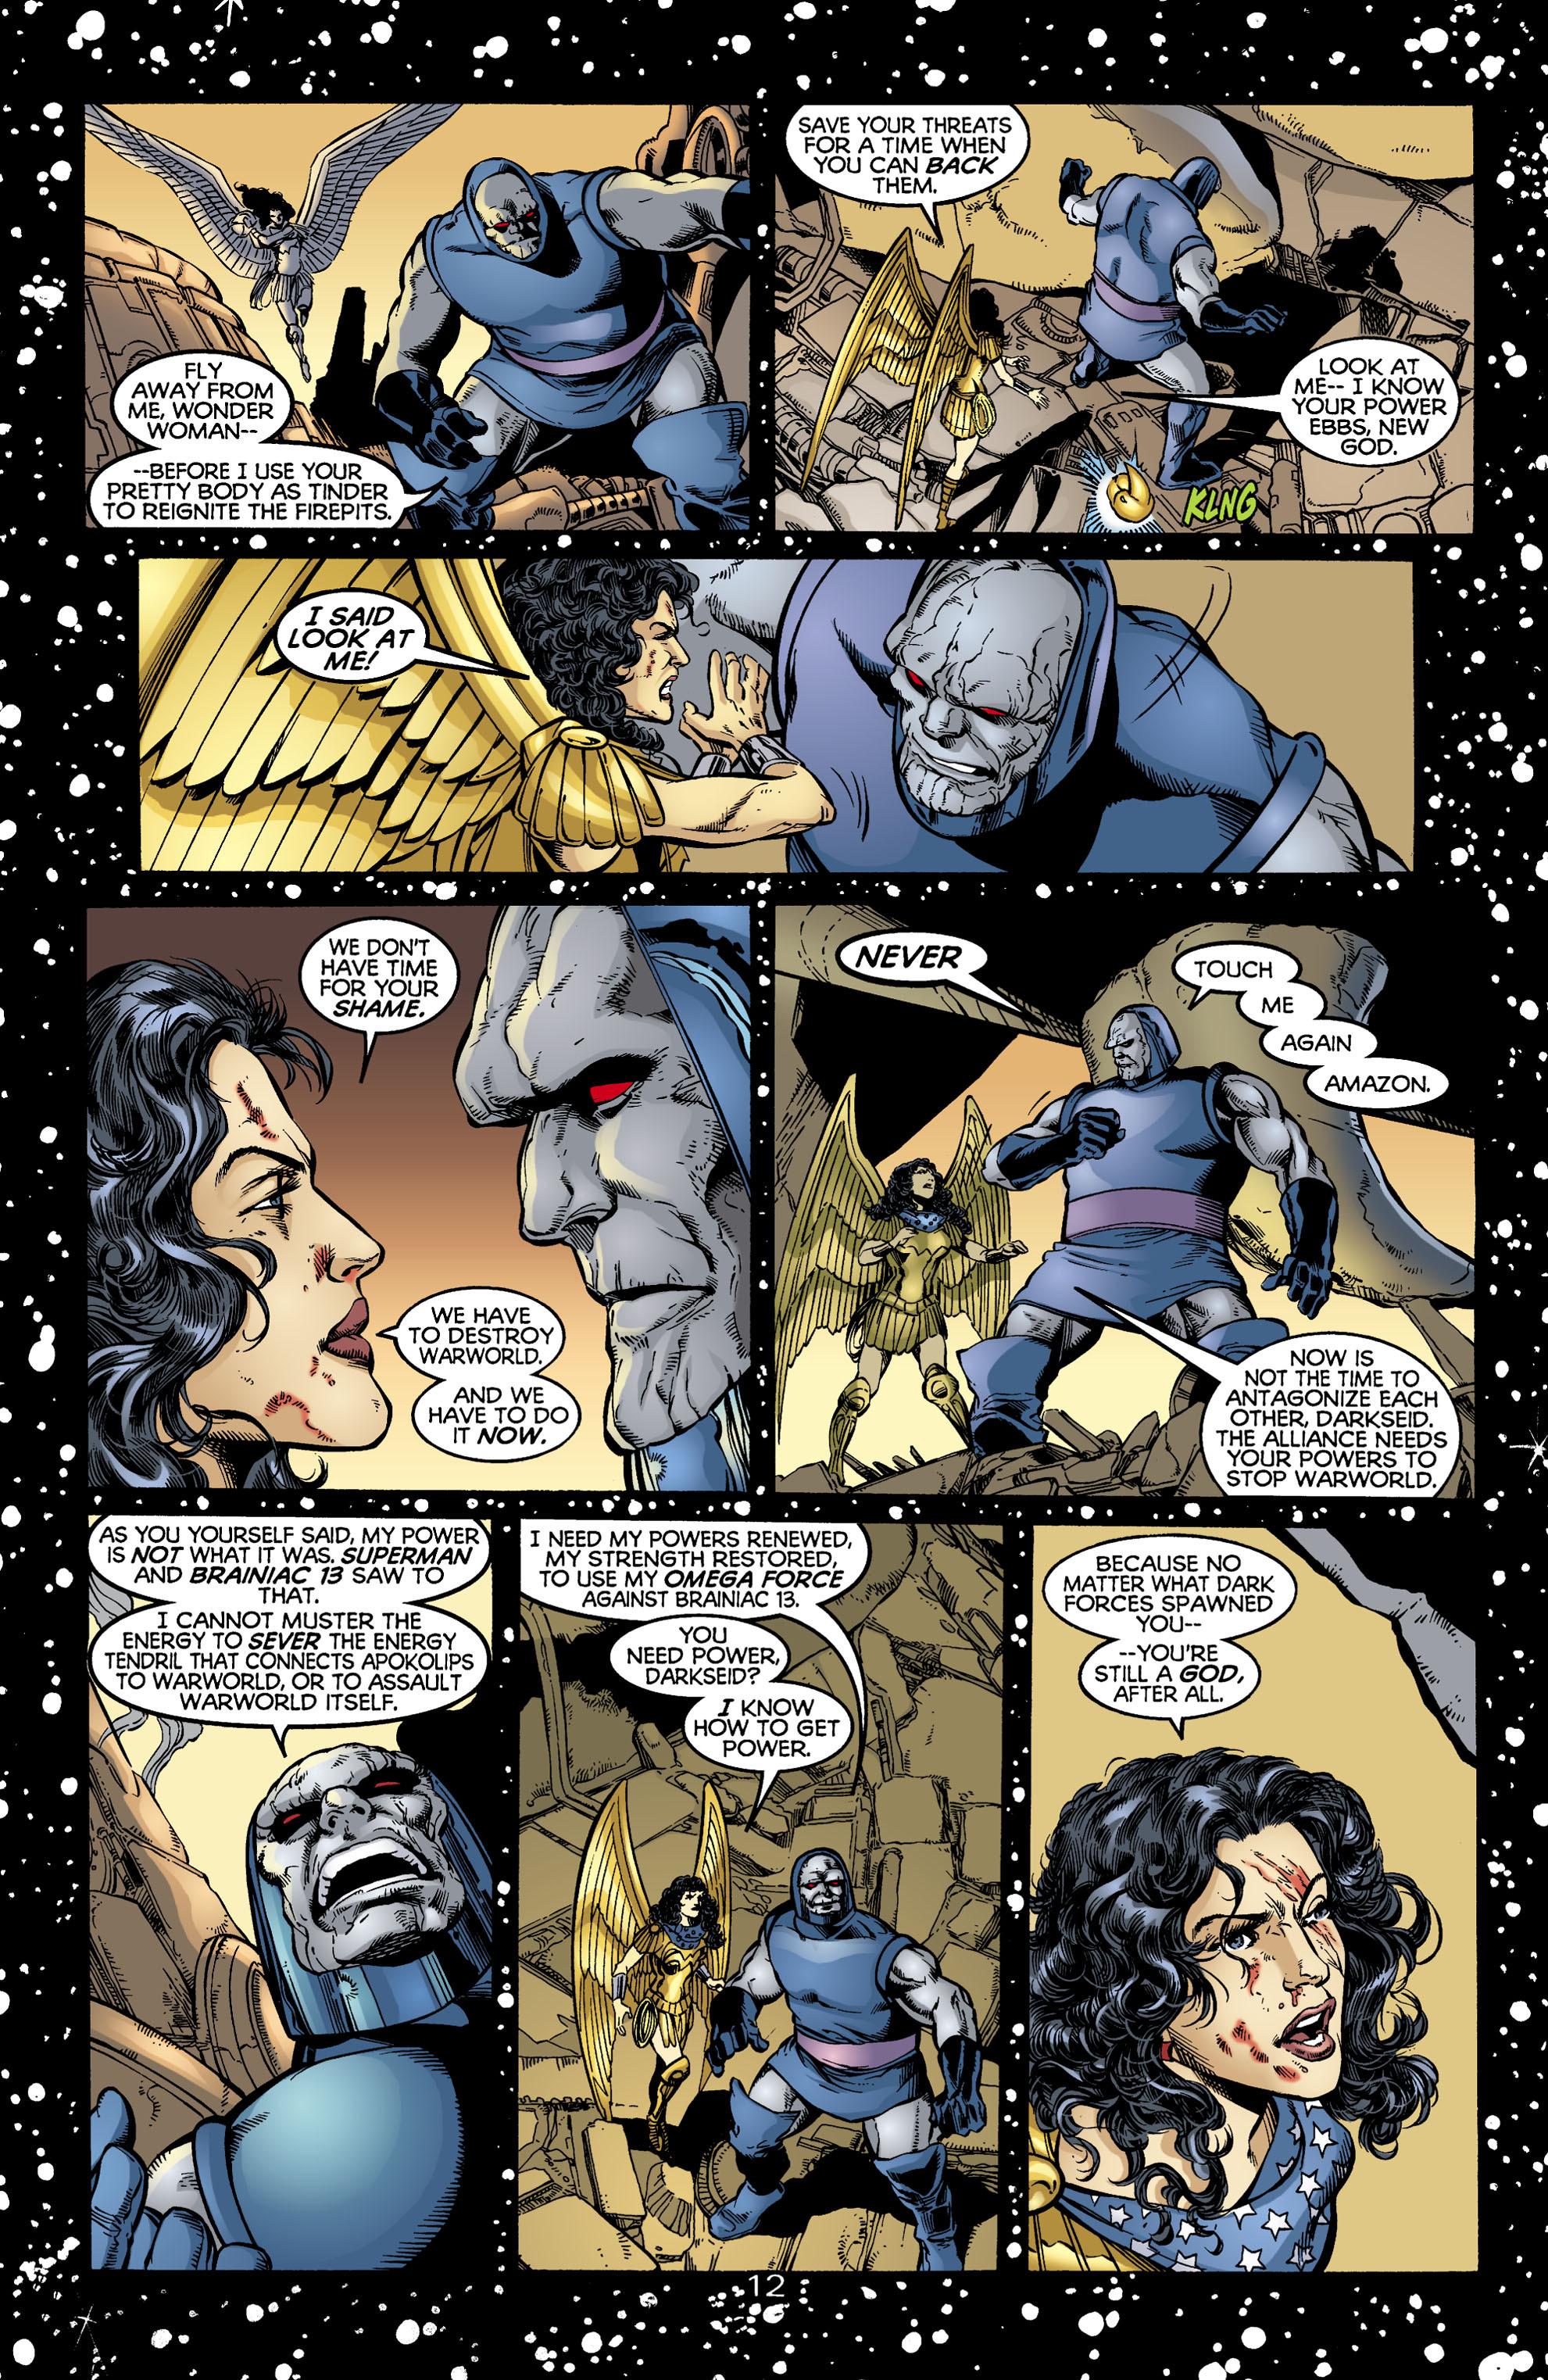 Read online Wonder Woman (1987) comic -  Issue #173 - 13